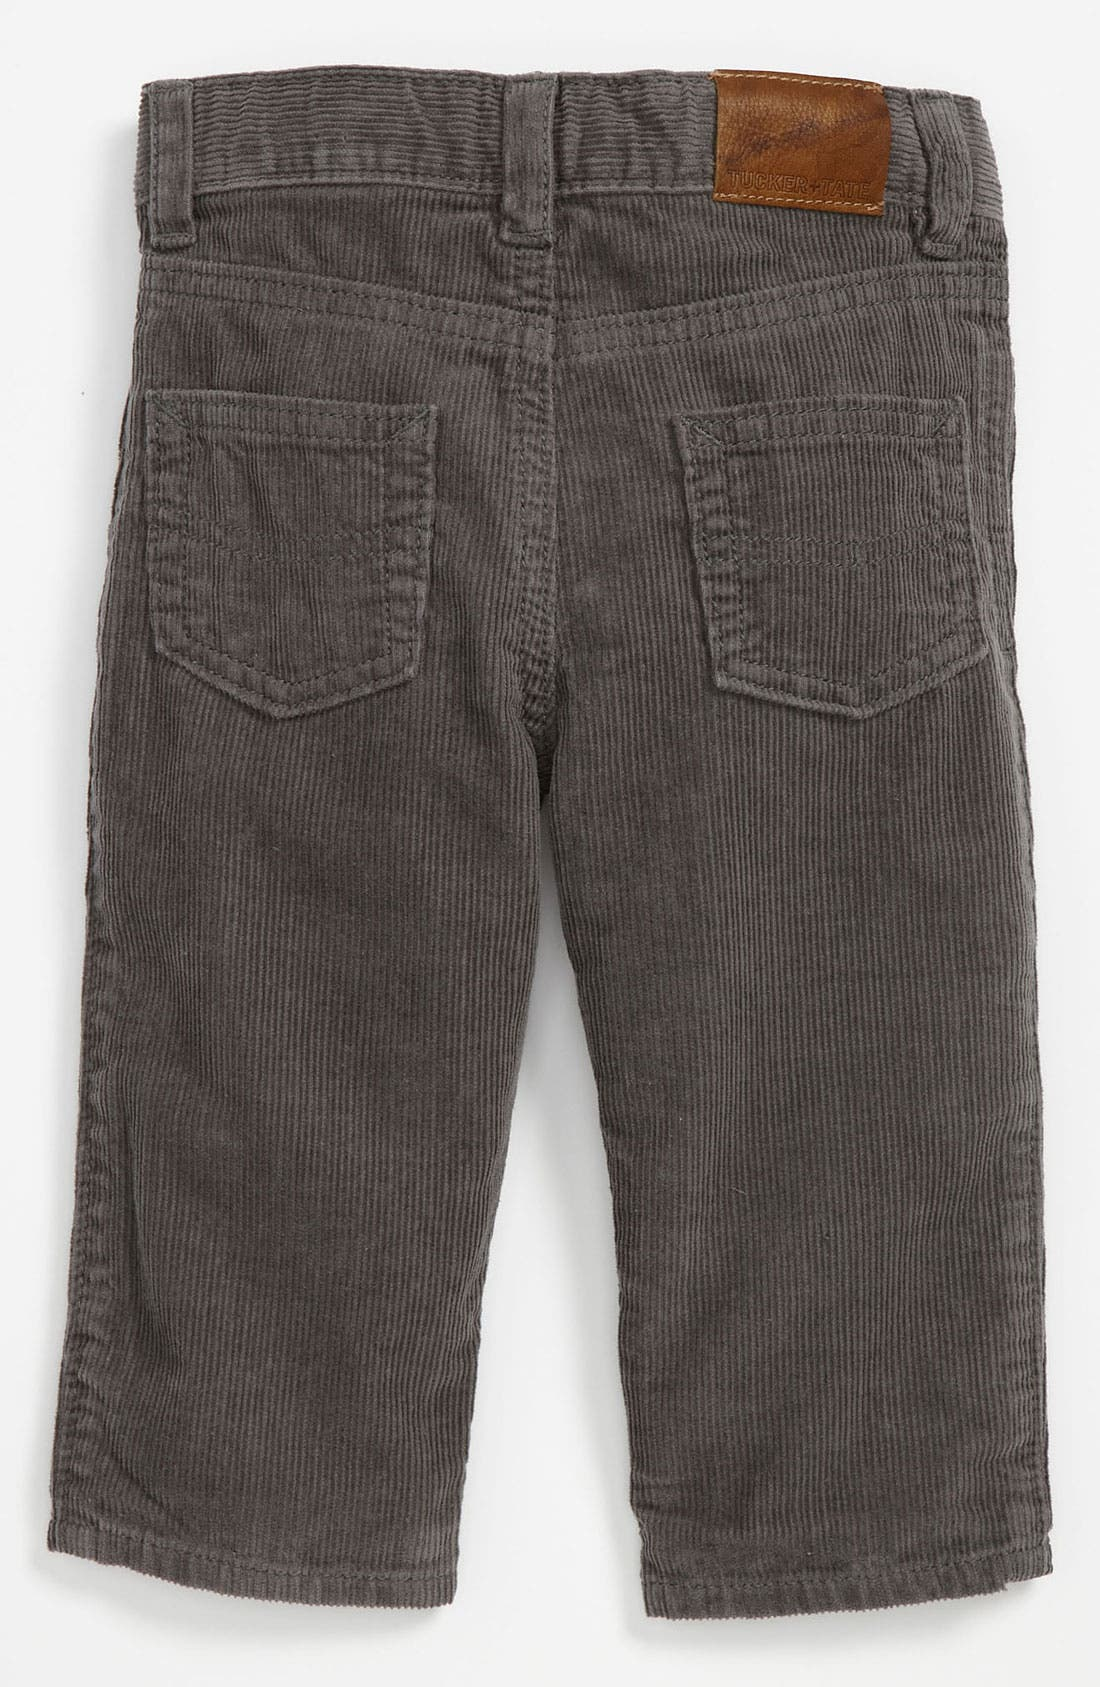 Alternate Image 1 Selected - Tucker + Tate Corduroy Pants (Toddler)